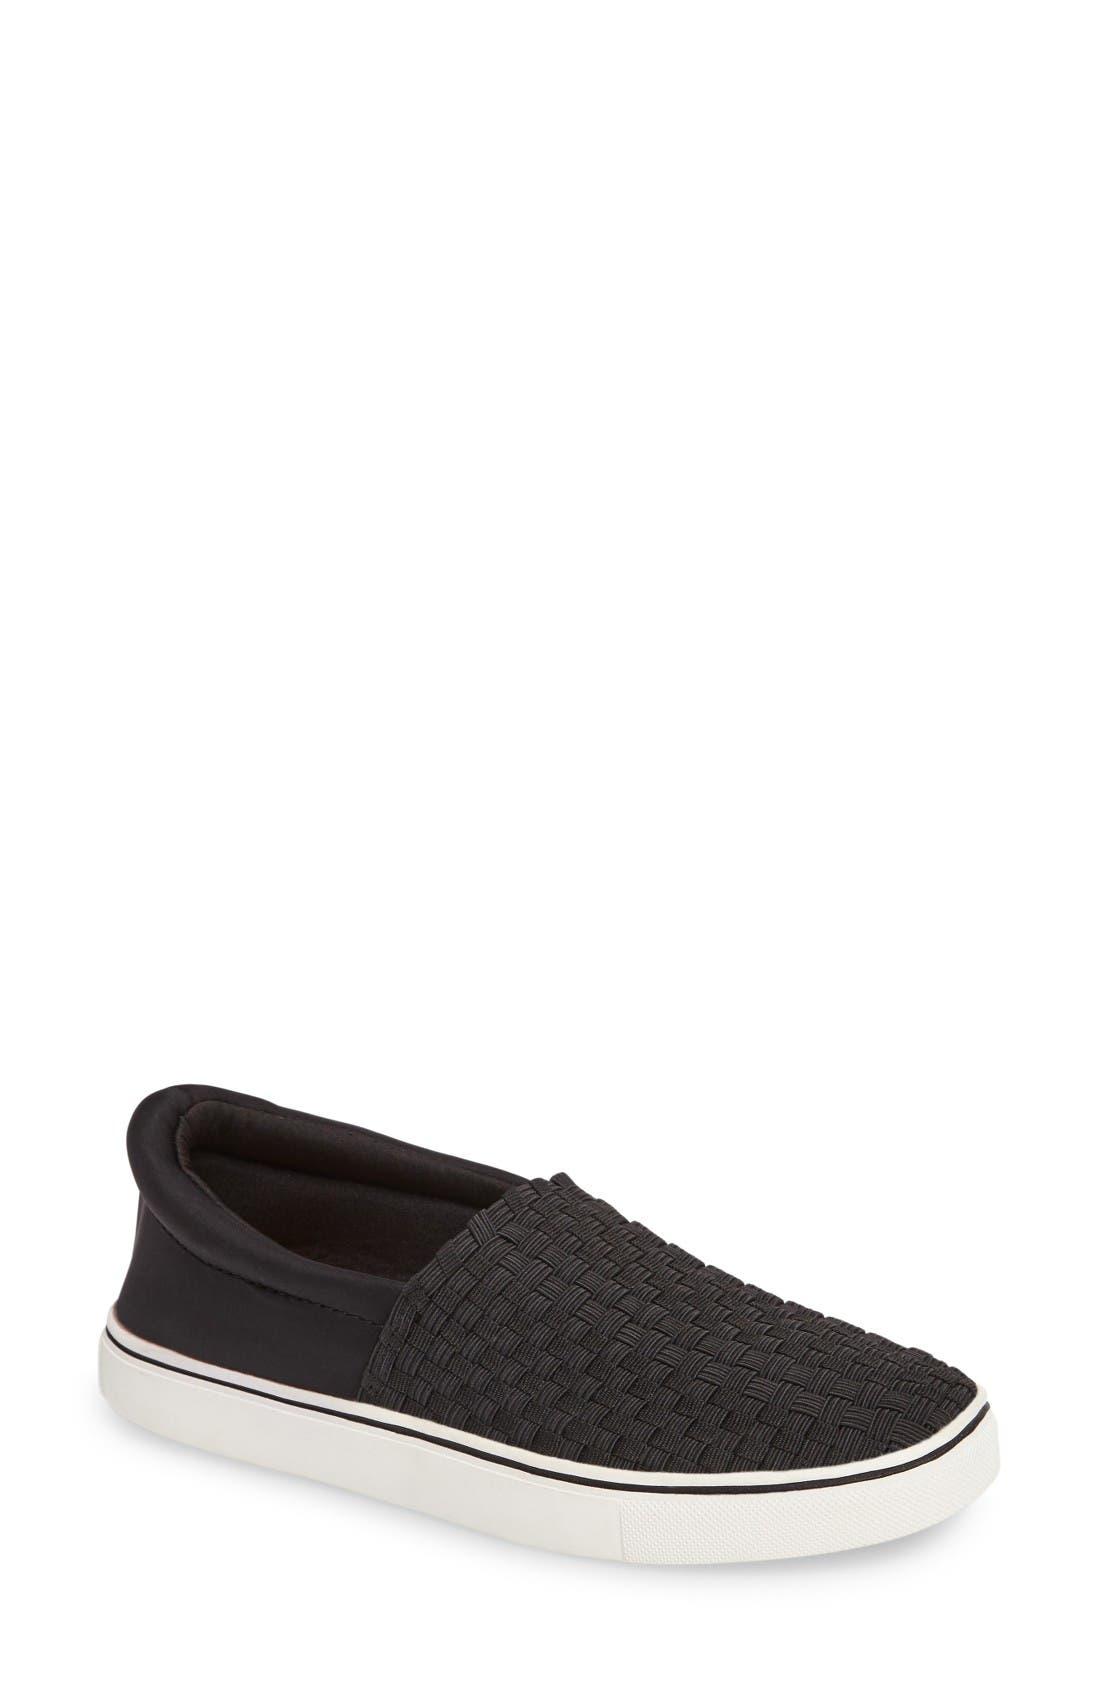 BERNIE MEV. Ofelia Woven Elastic Sneaker